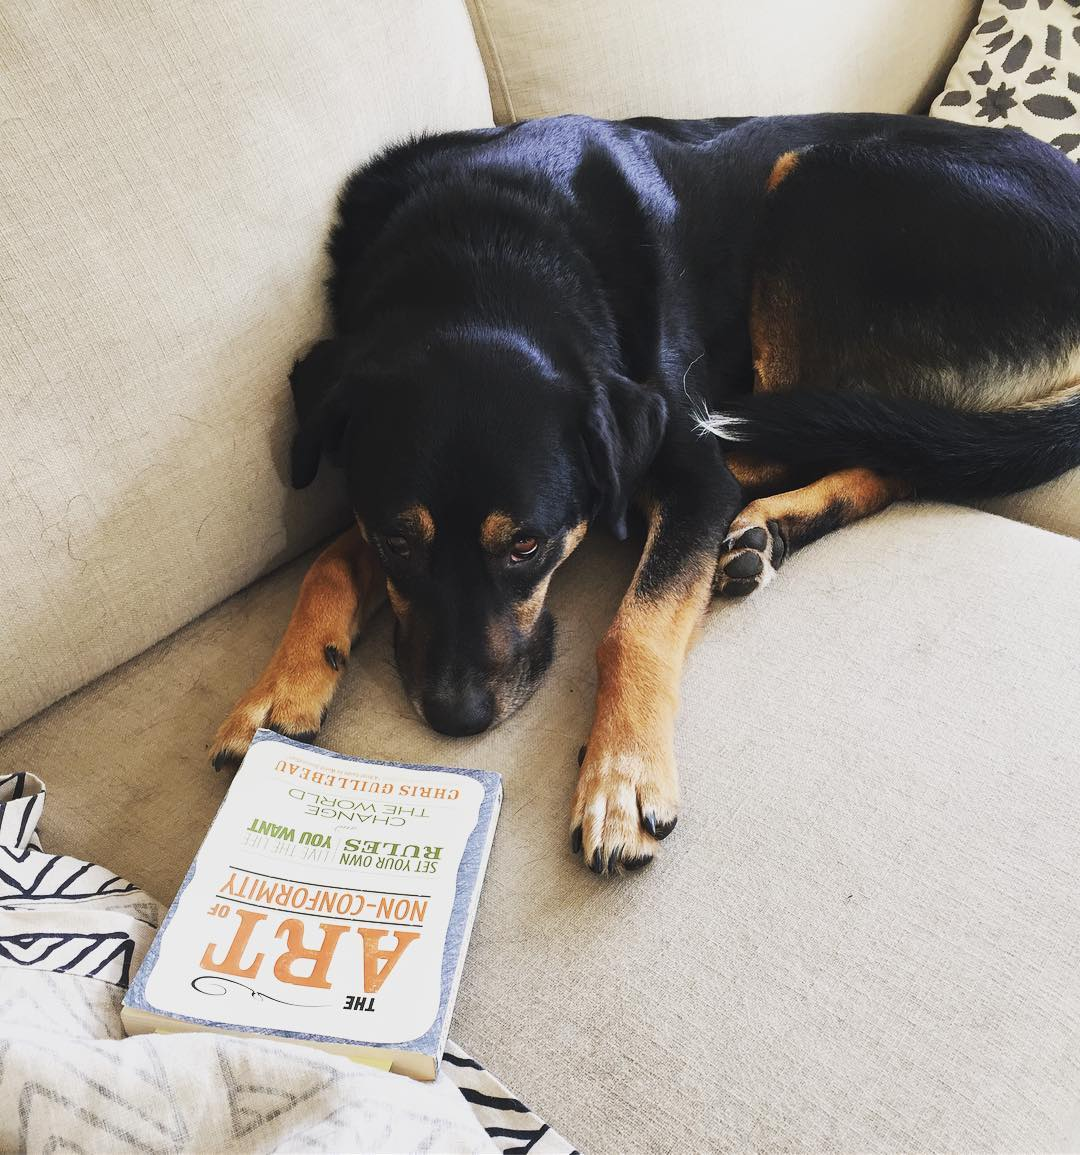 Ok maybe I should be worried. He's reading self-help books.